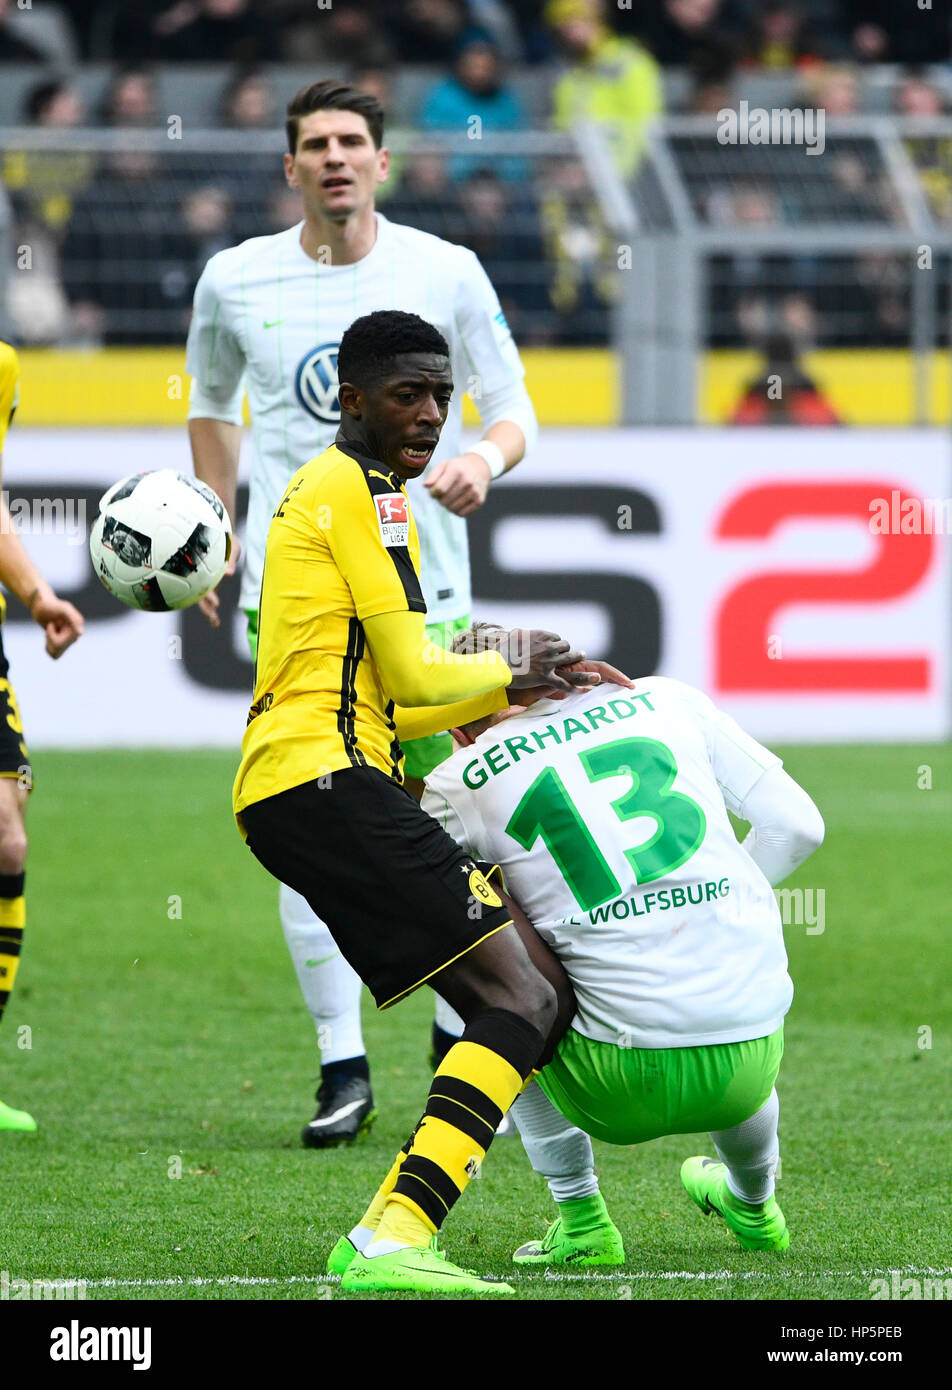 Signal-Iduna Park, Dortmund, Germany. 18th February, 2017. German football Bundesliga Season 2016/17, matchday 21, - Stock Image